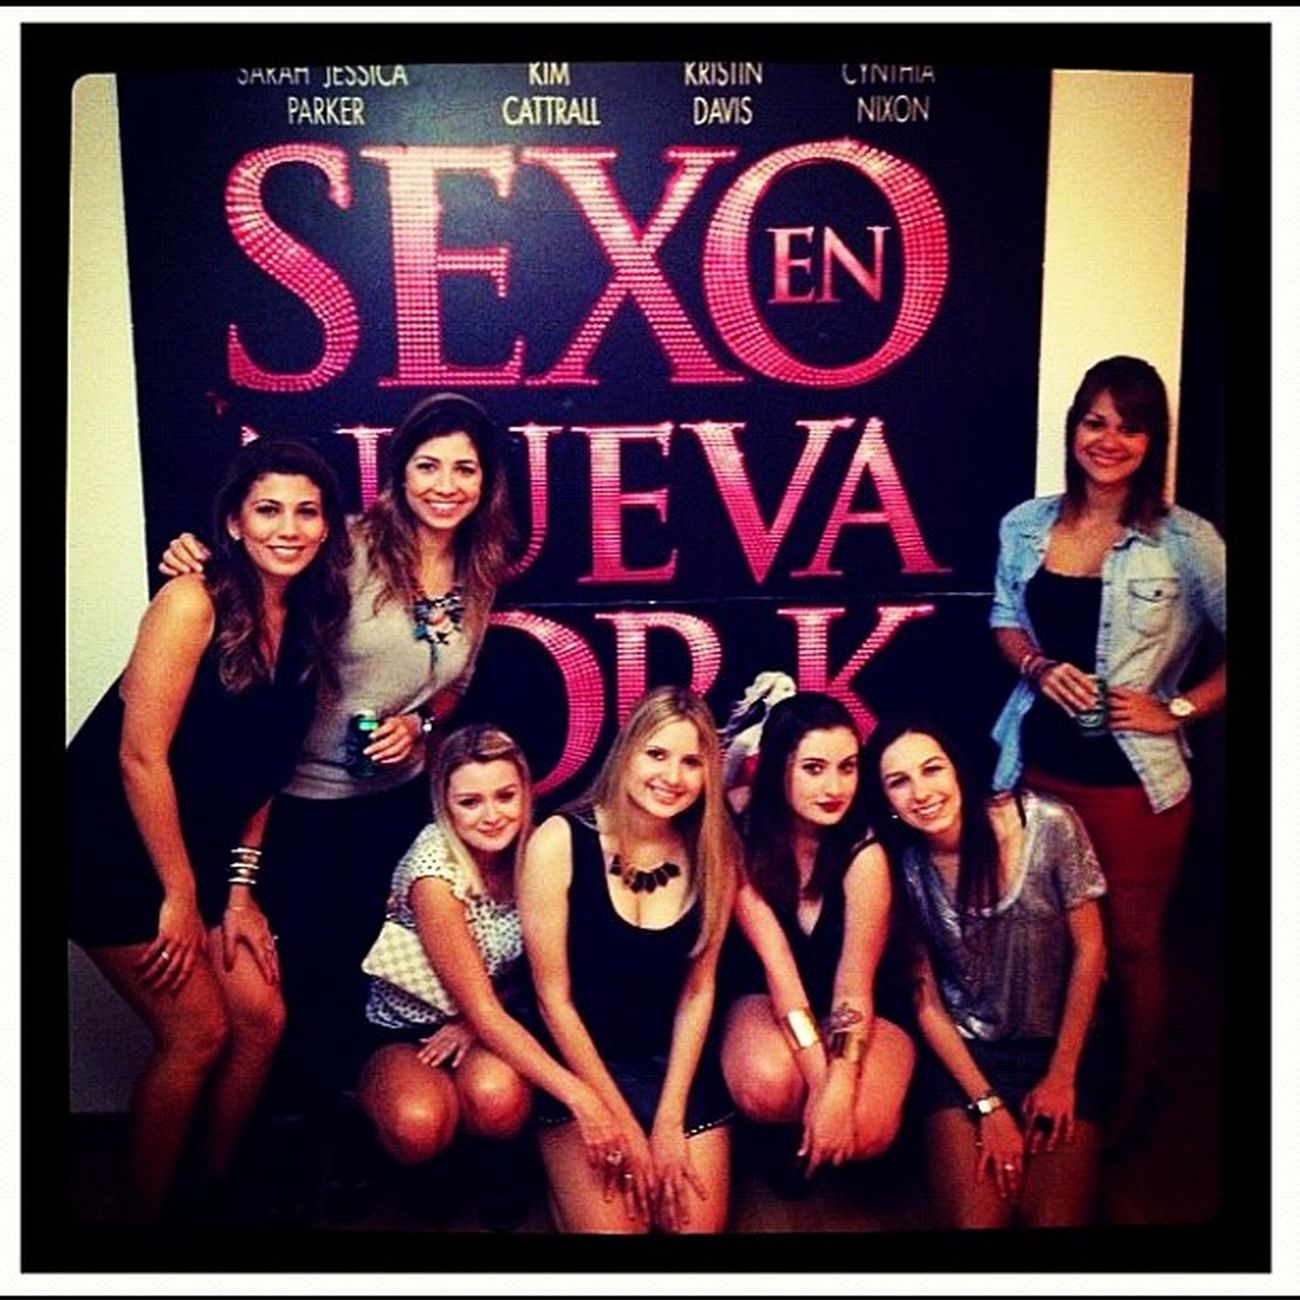 Girls night out ???